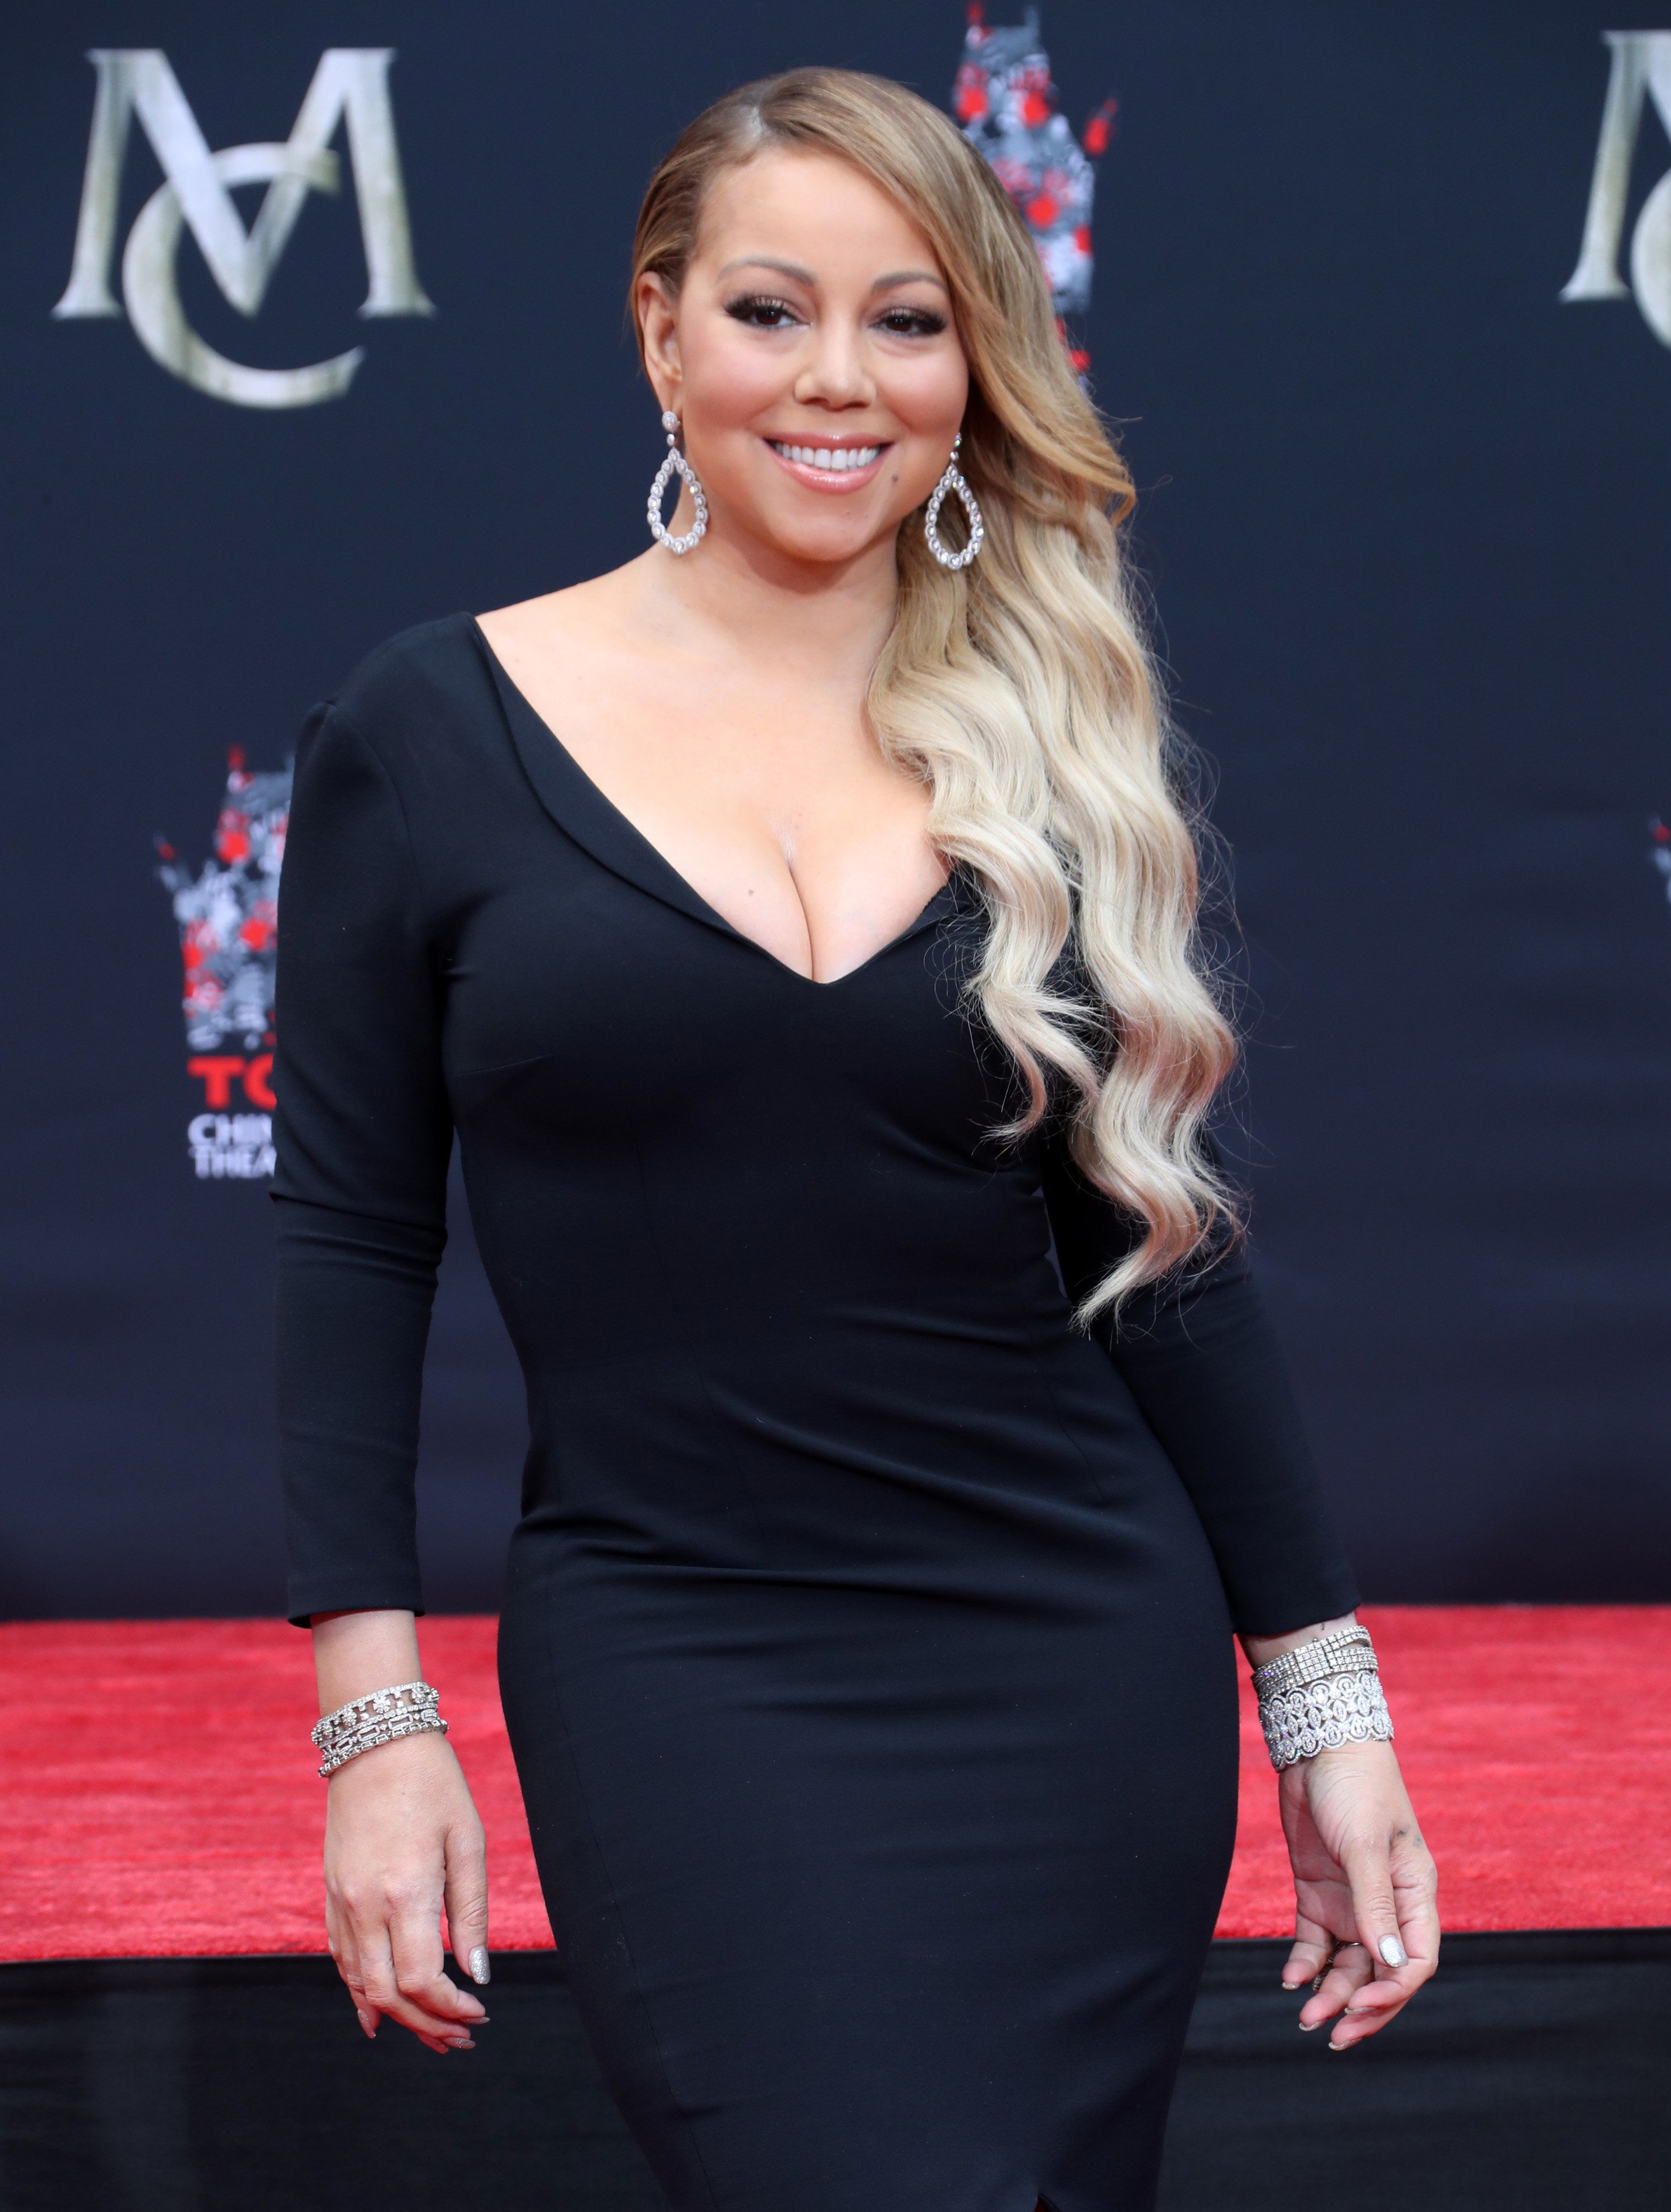 Mariah Carey Discusses Bipolar Disorder Diagnosis For The First